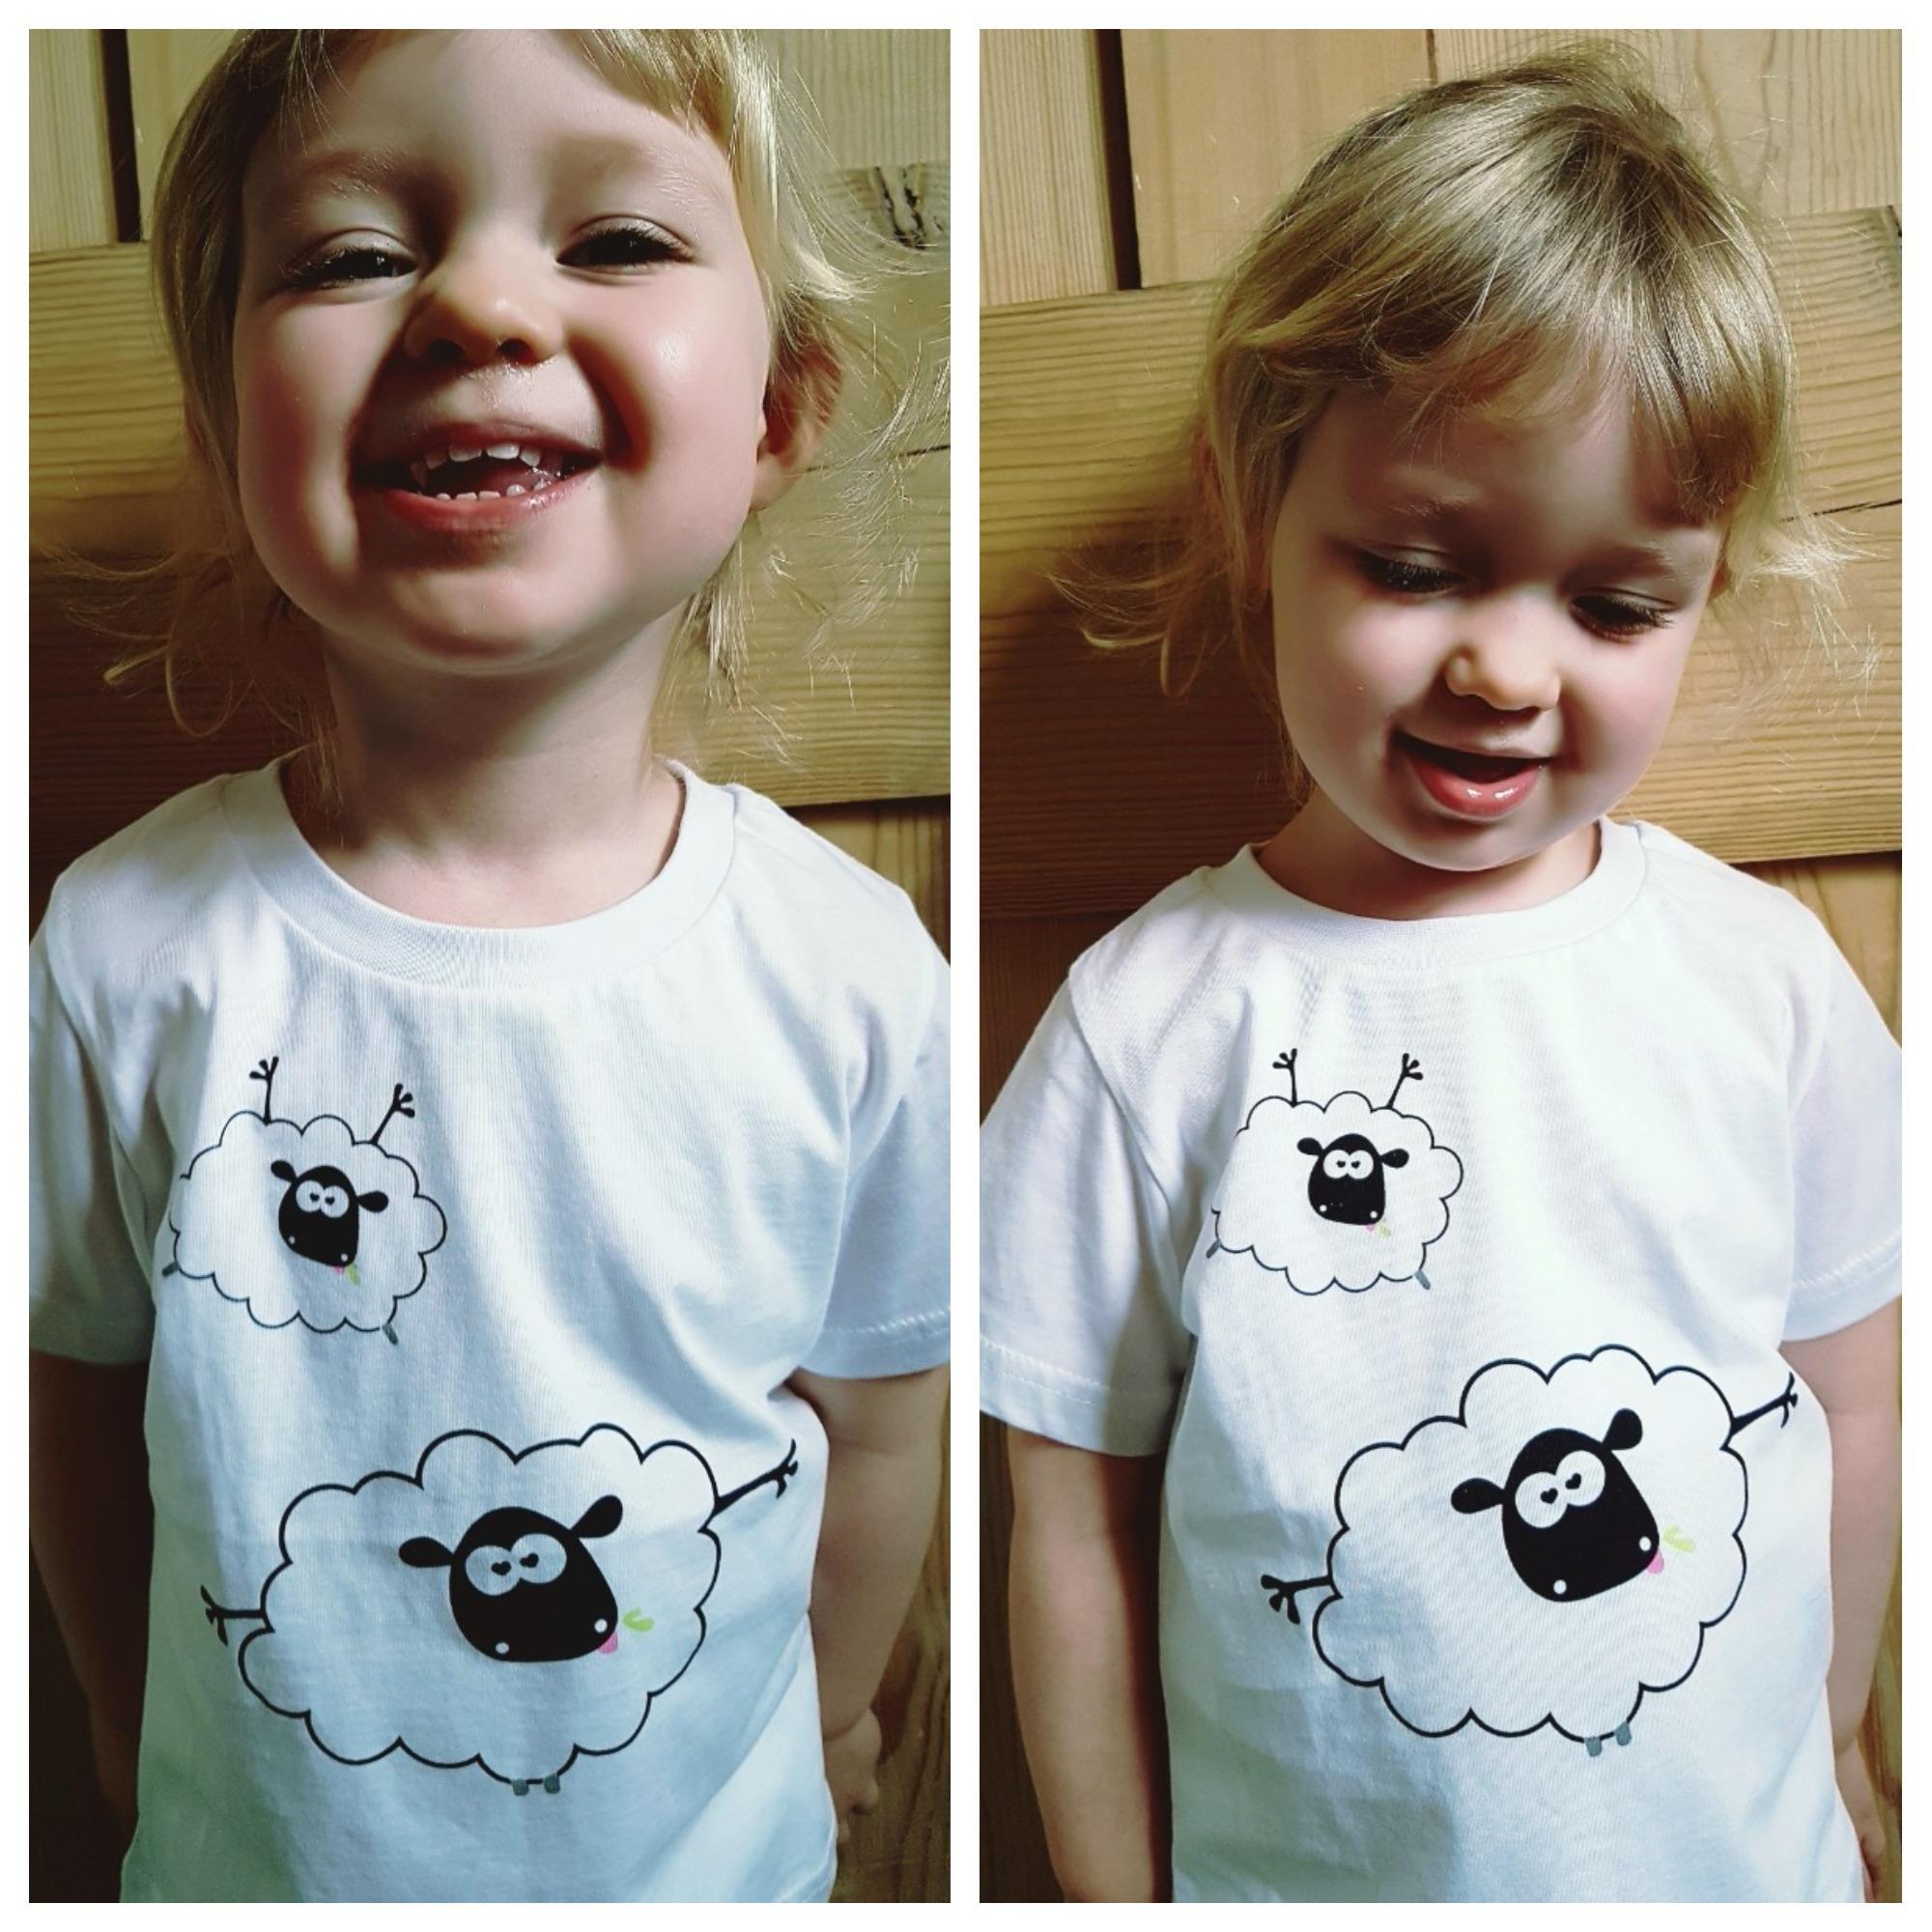 Quack Quack Moo Clothing Review